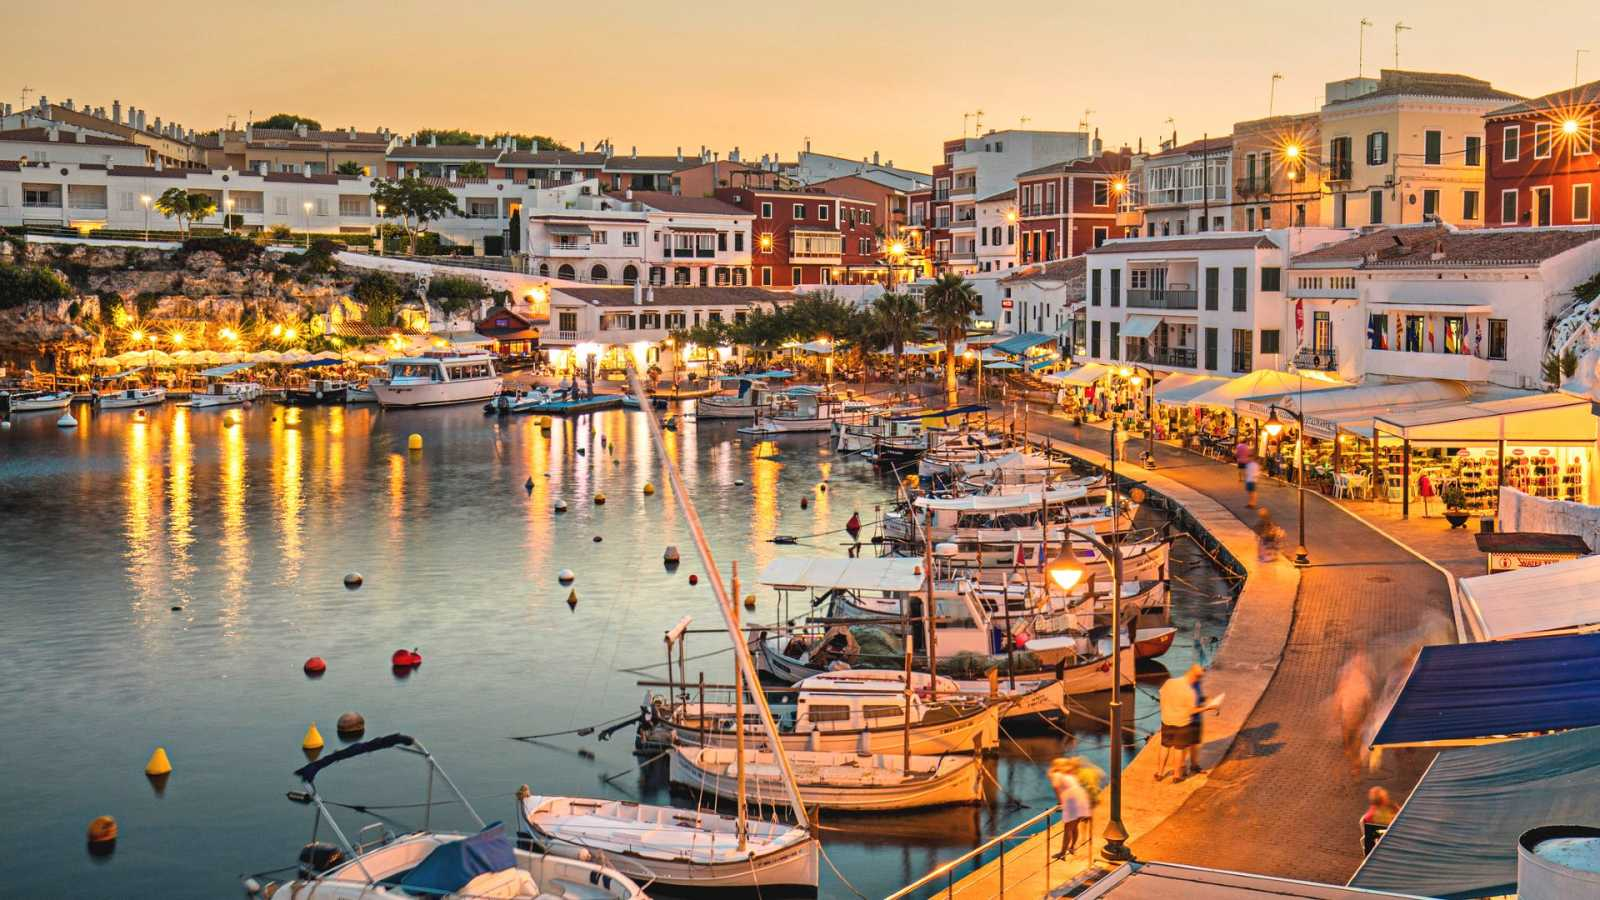 Nómadas - Menorca, universo mediterráneo - 12/12/20 - escuchar ahora